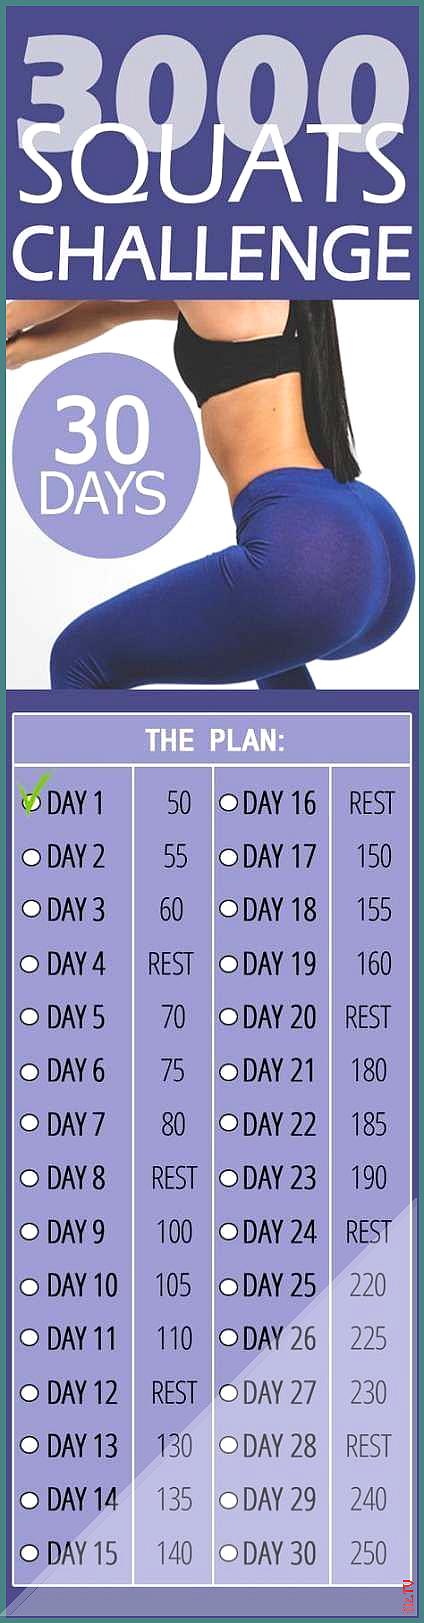 67 New ideas fitness challenge plank push up 67 New ideas fitness challenge plank push up jade Jones...